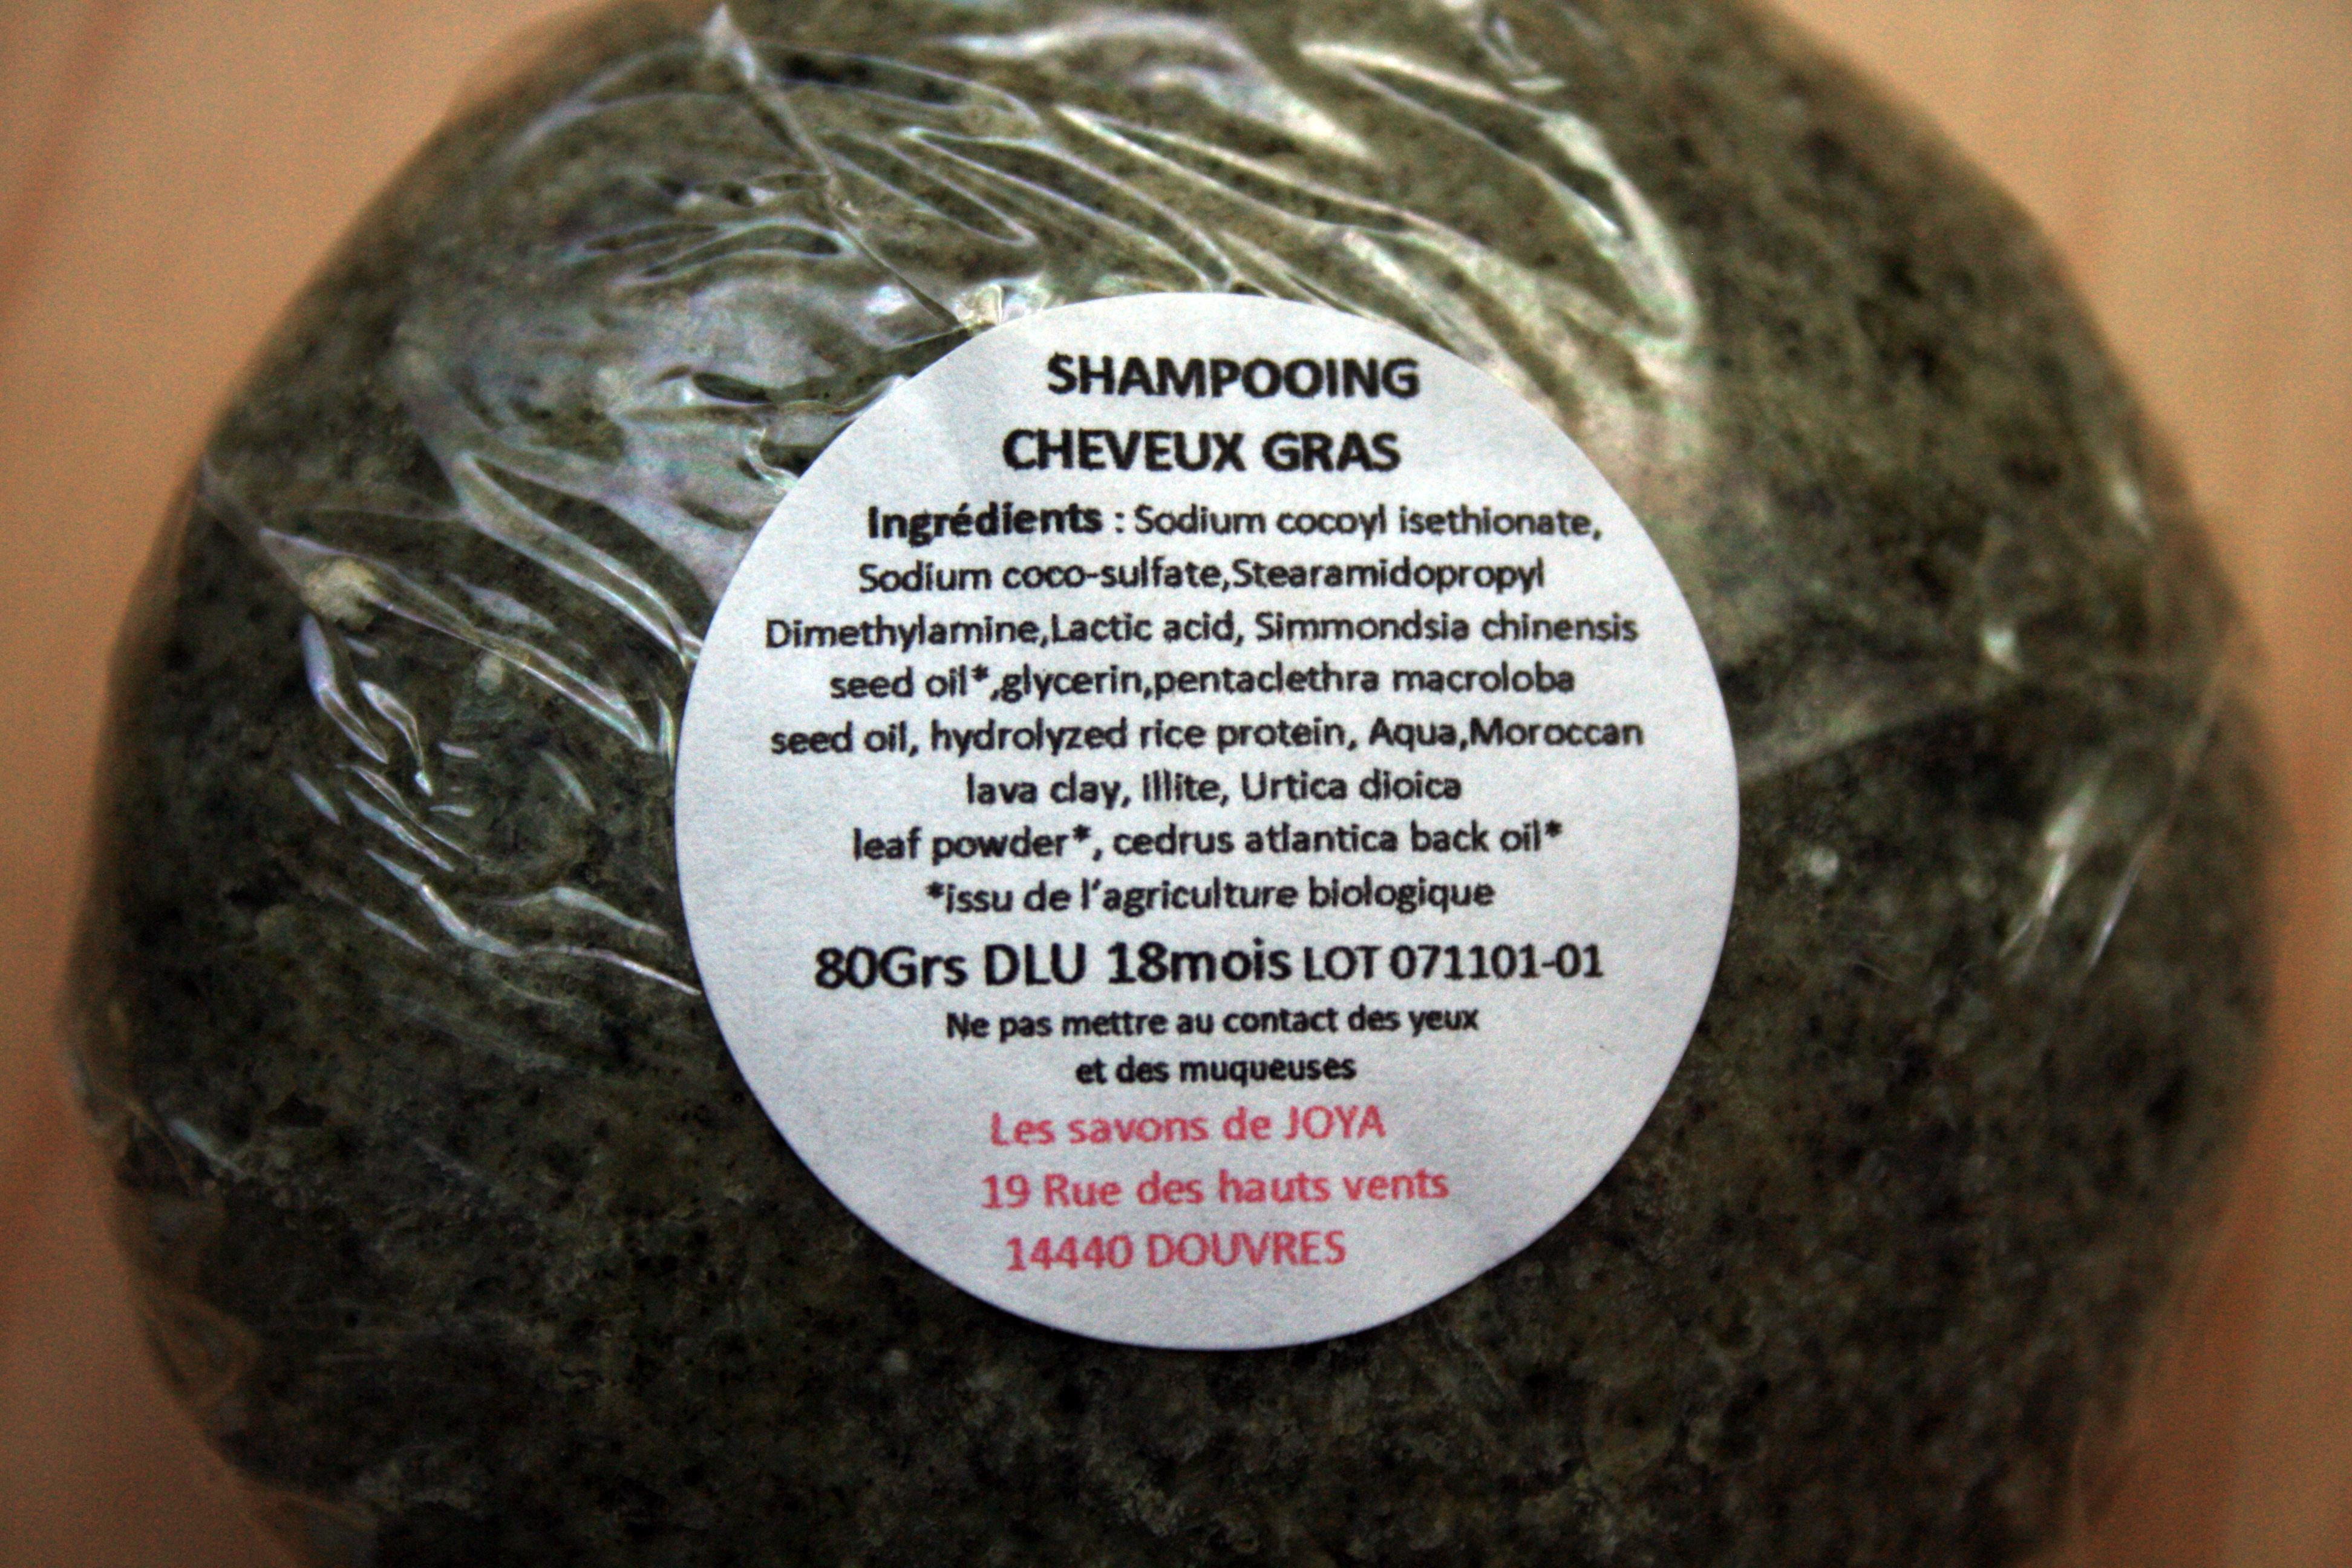 Shampoing solide Savons de joya